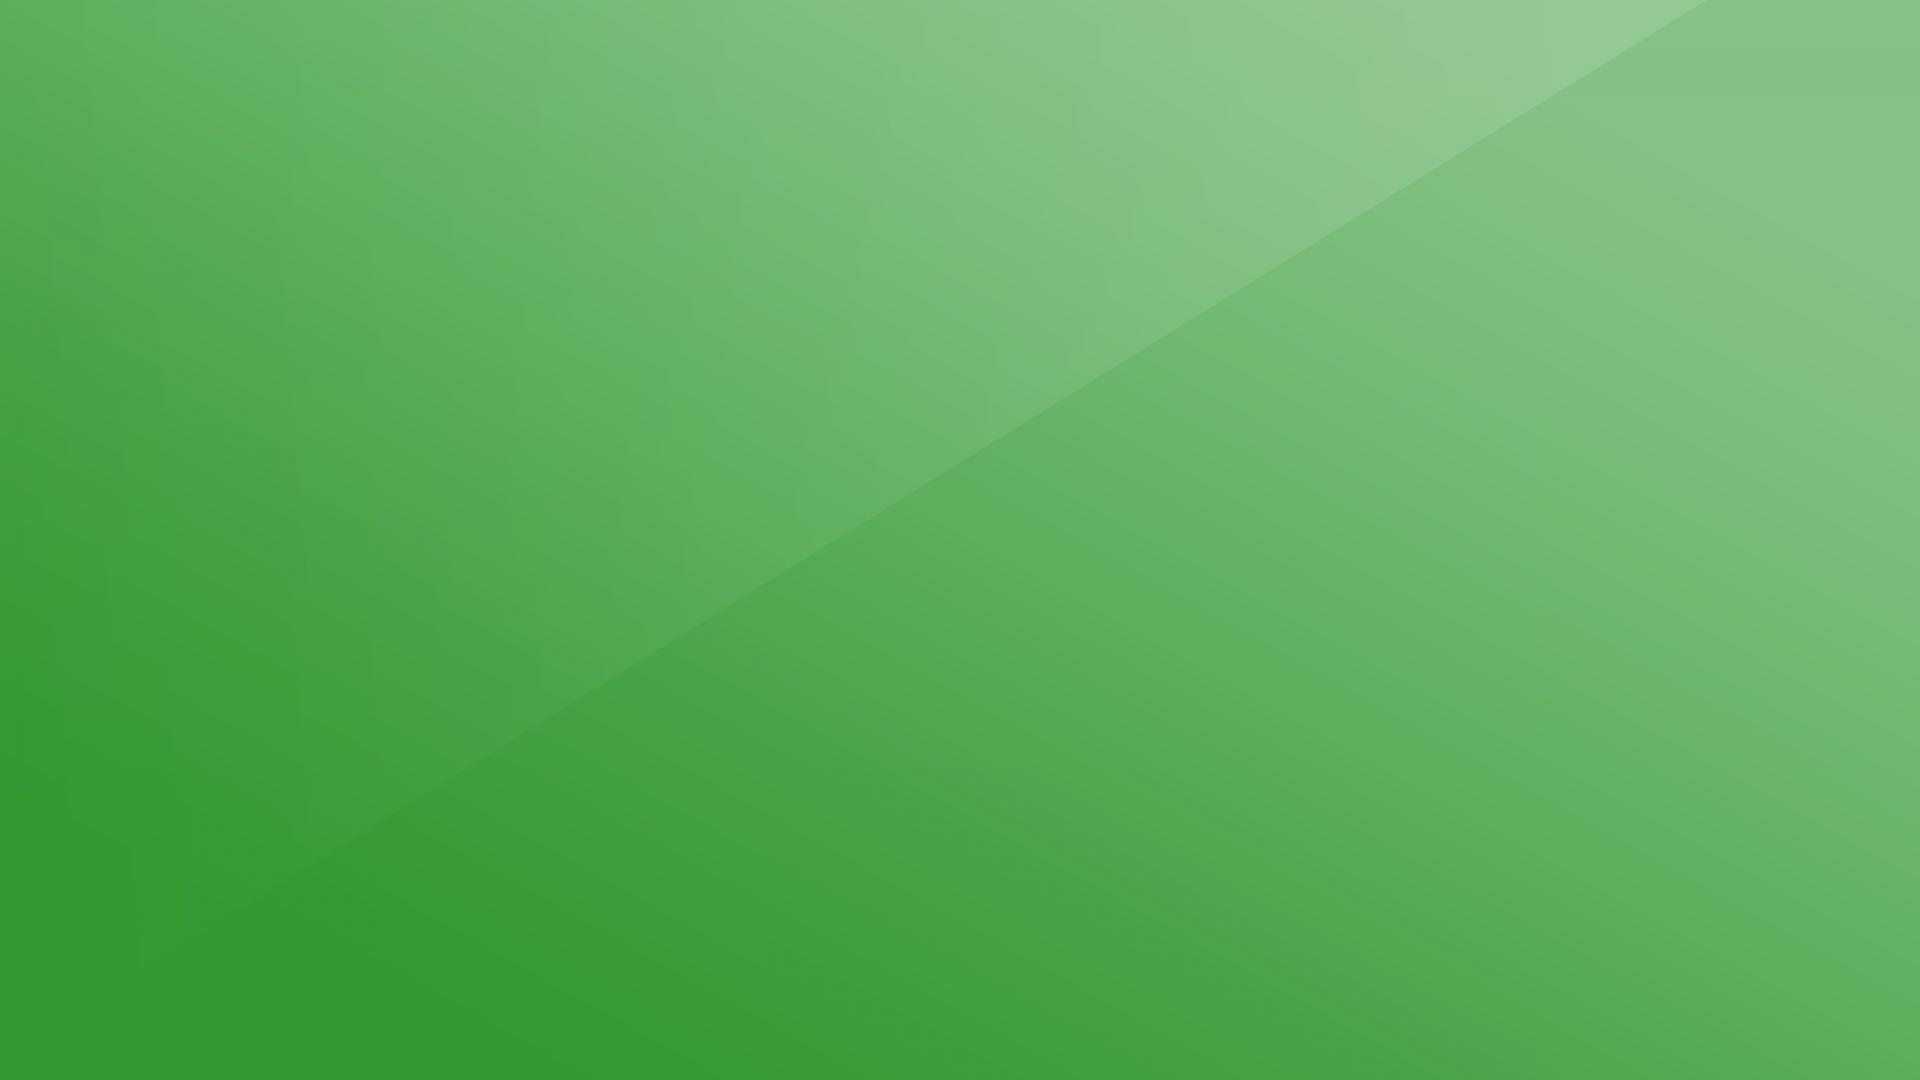 Fondo verde - 1920x1080